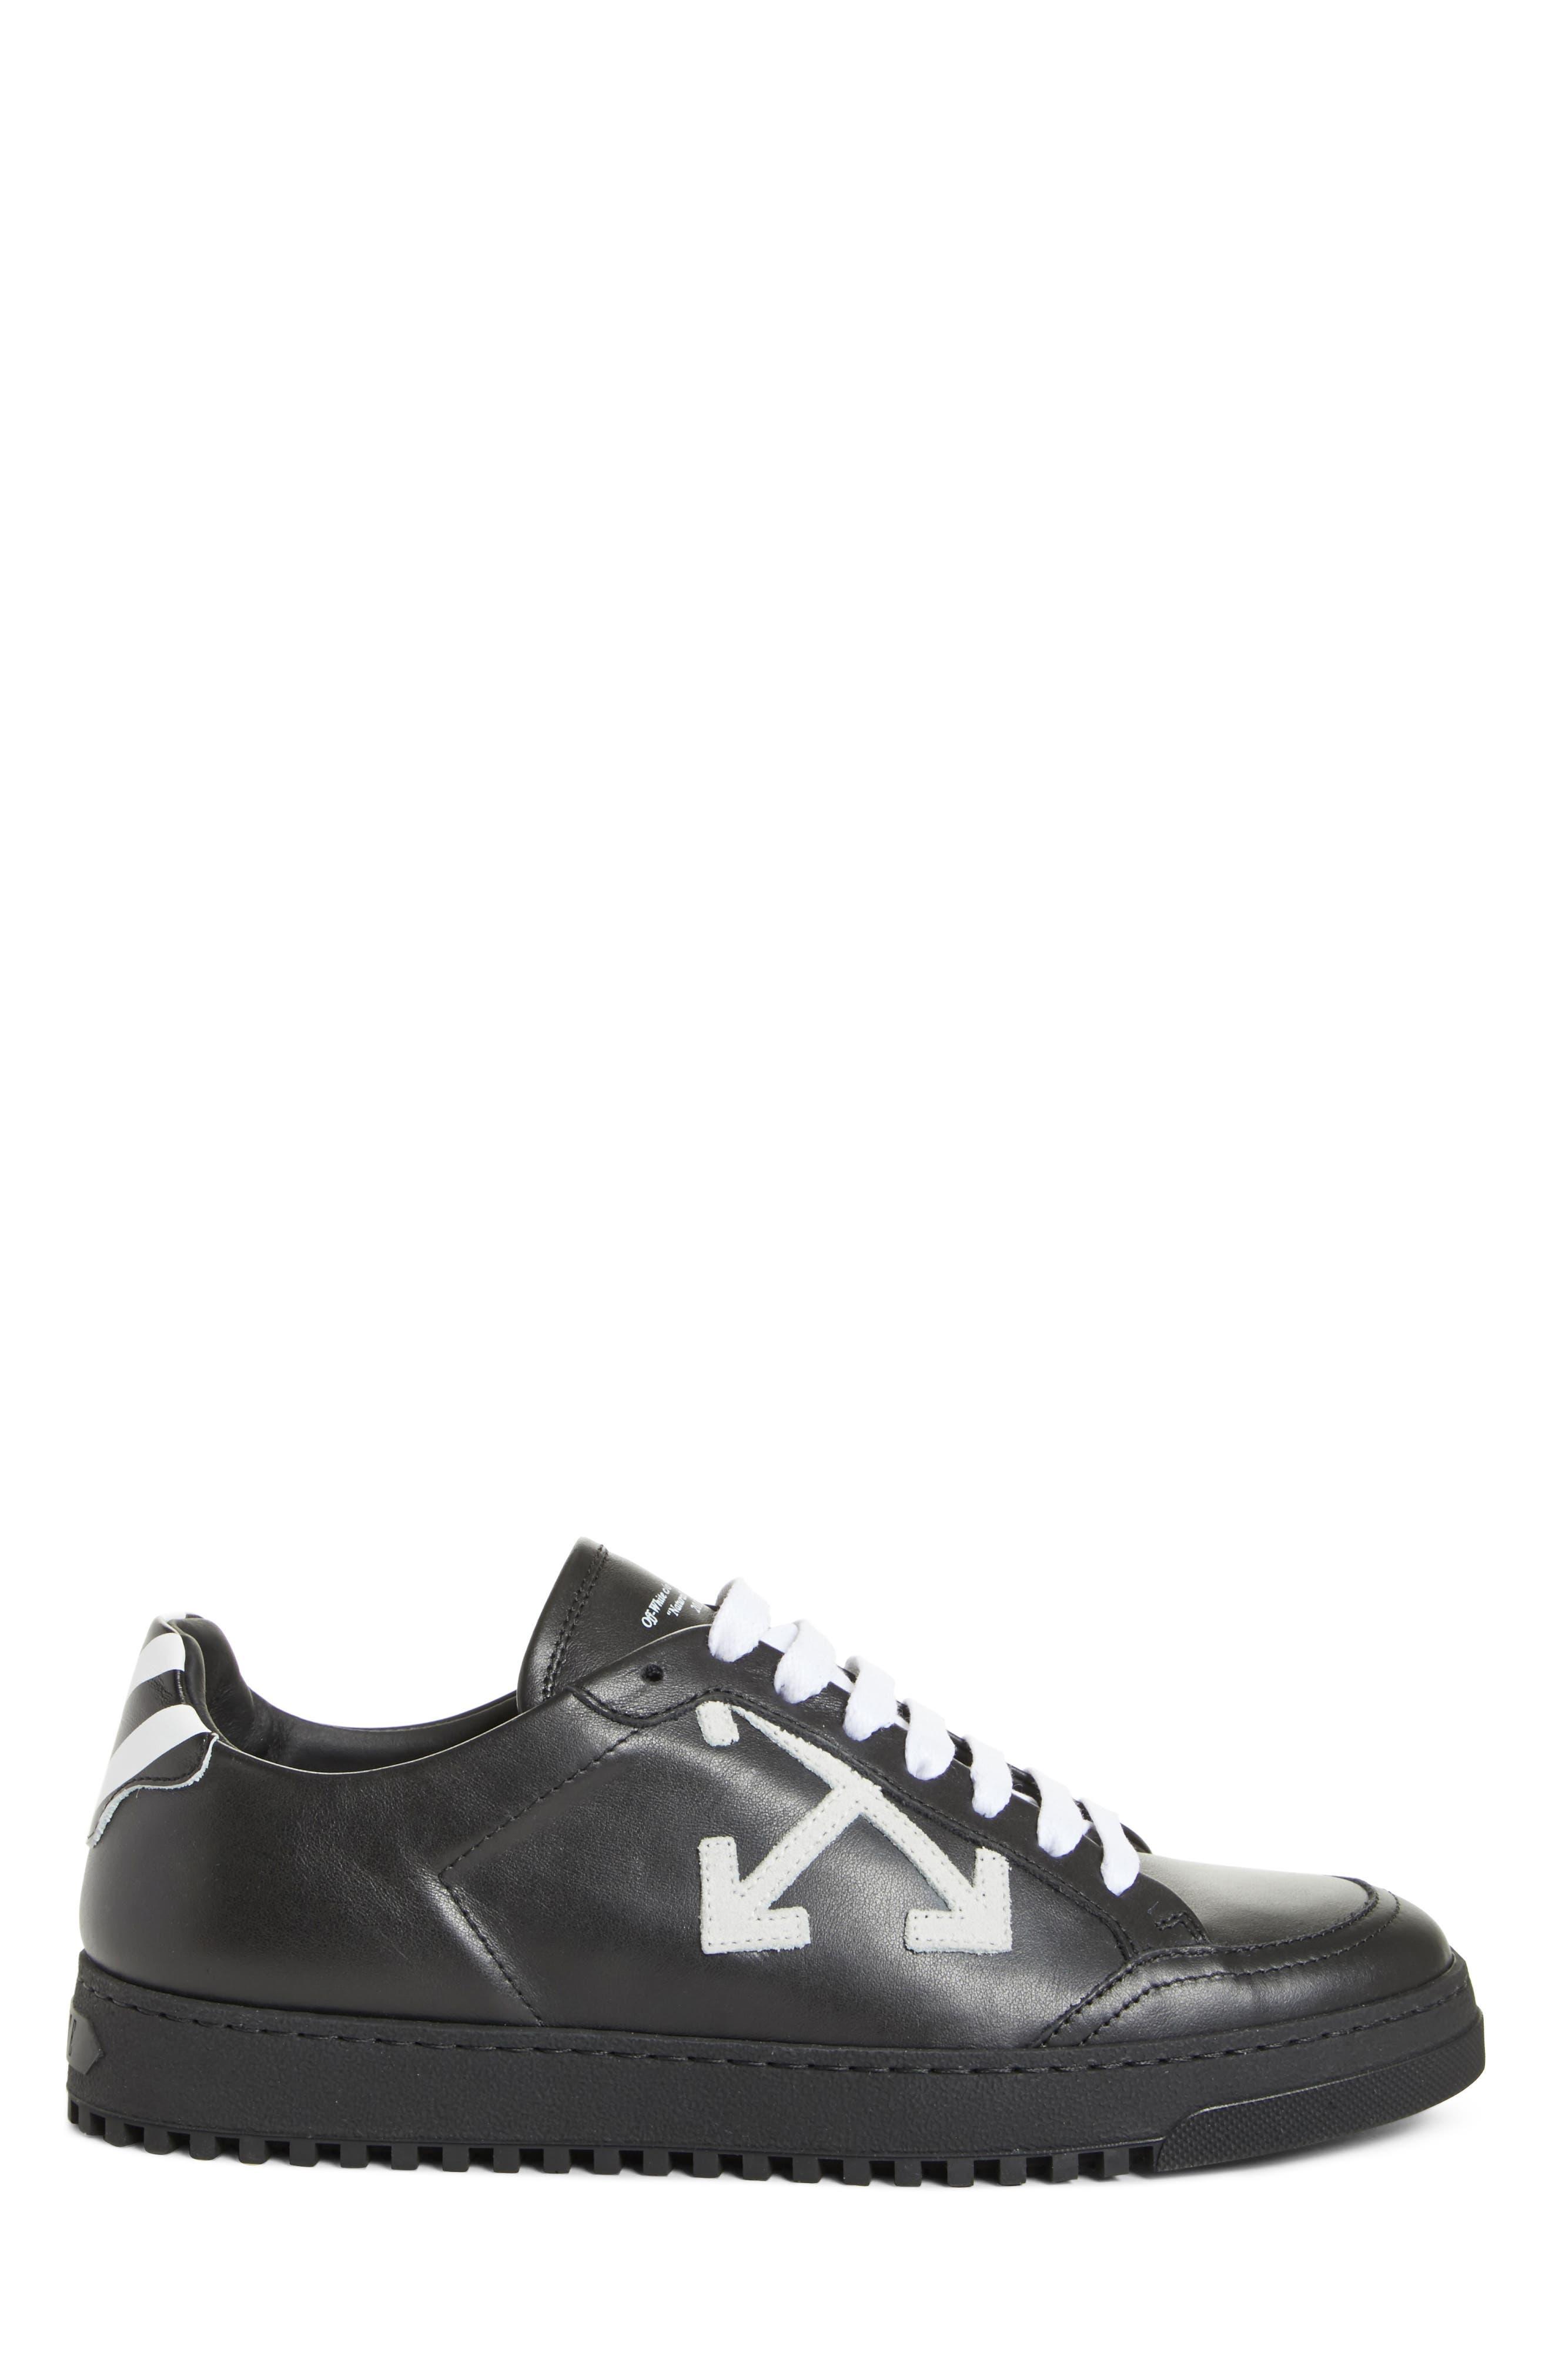 Arrow Sneaker,                             Alternate thumbnail 3, color,                             Black White